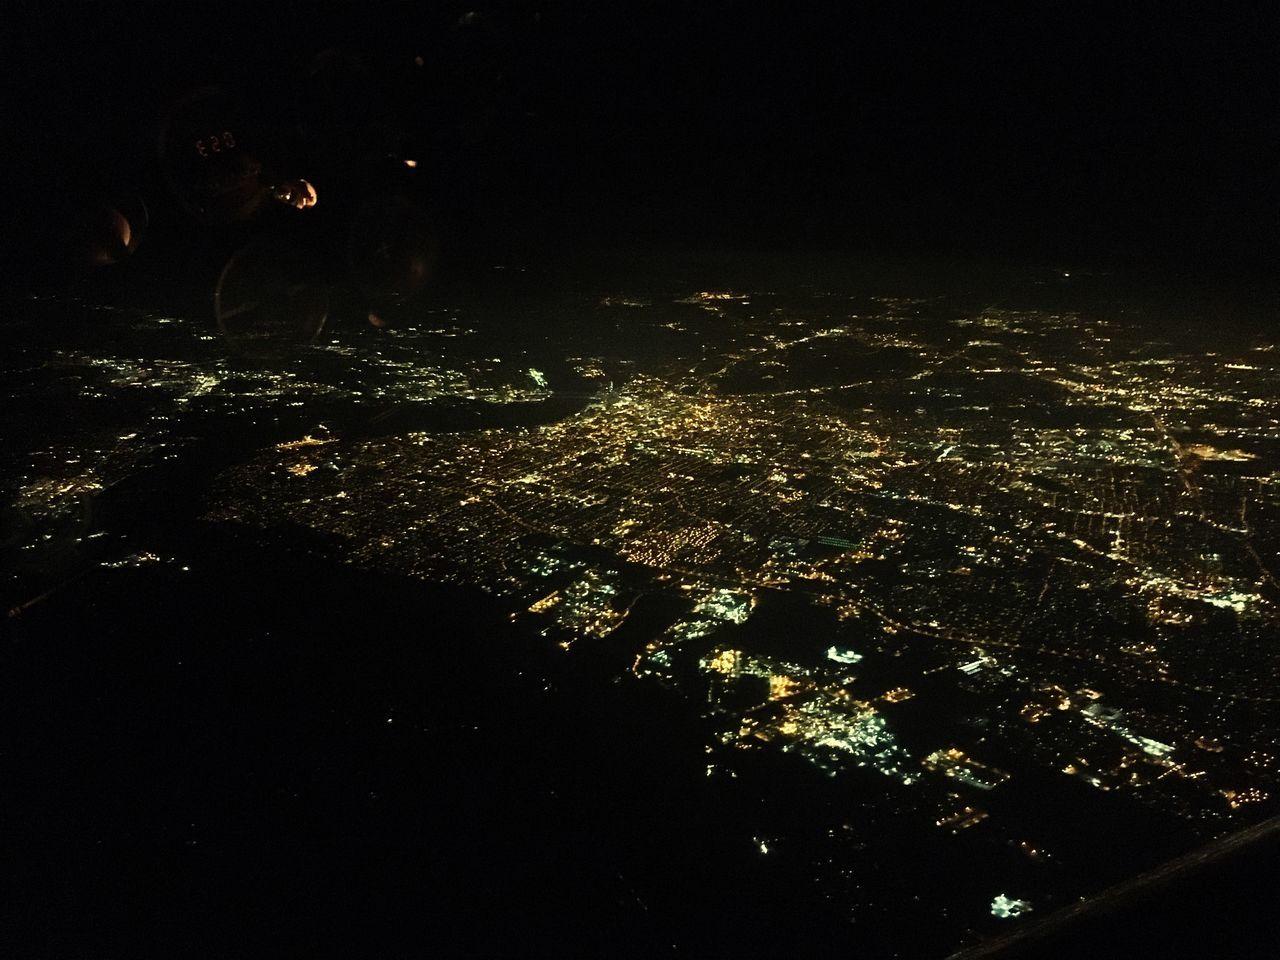 night, outdoors, illuminated, no people, water, tree, nature, cityscape